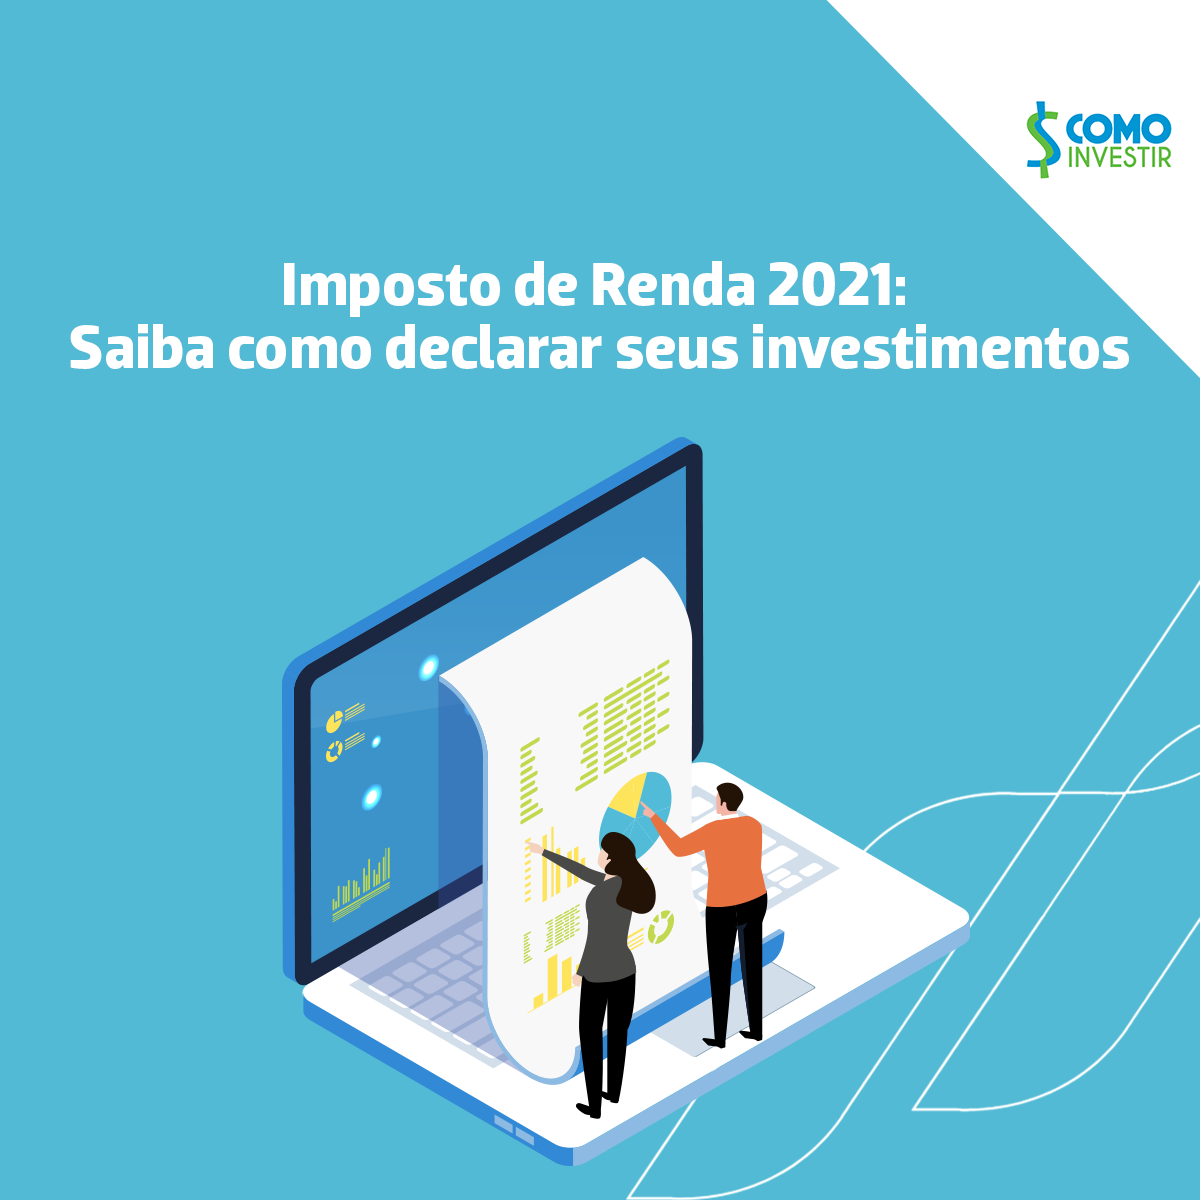 Imposto de Renda 2021: saiba como declarar seus investimentos!